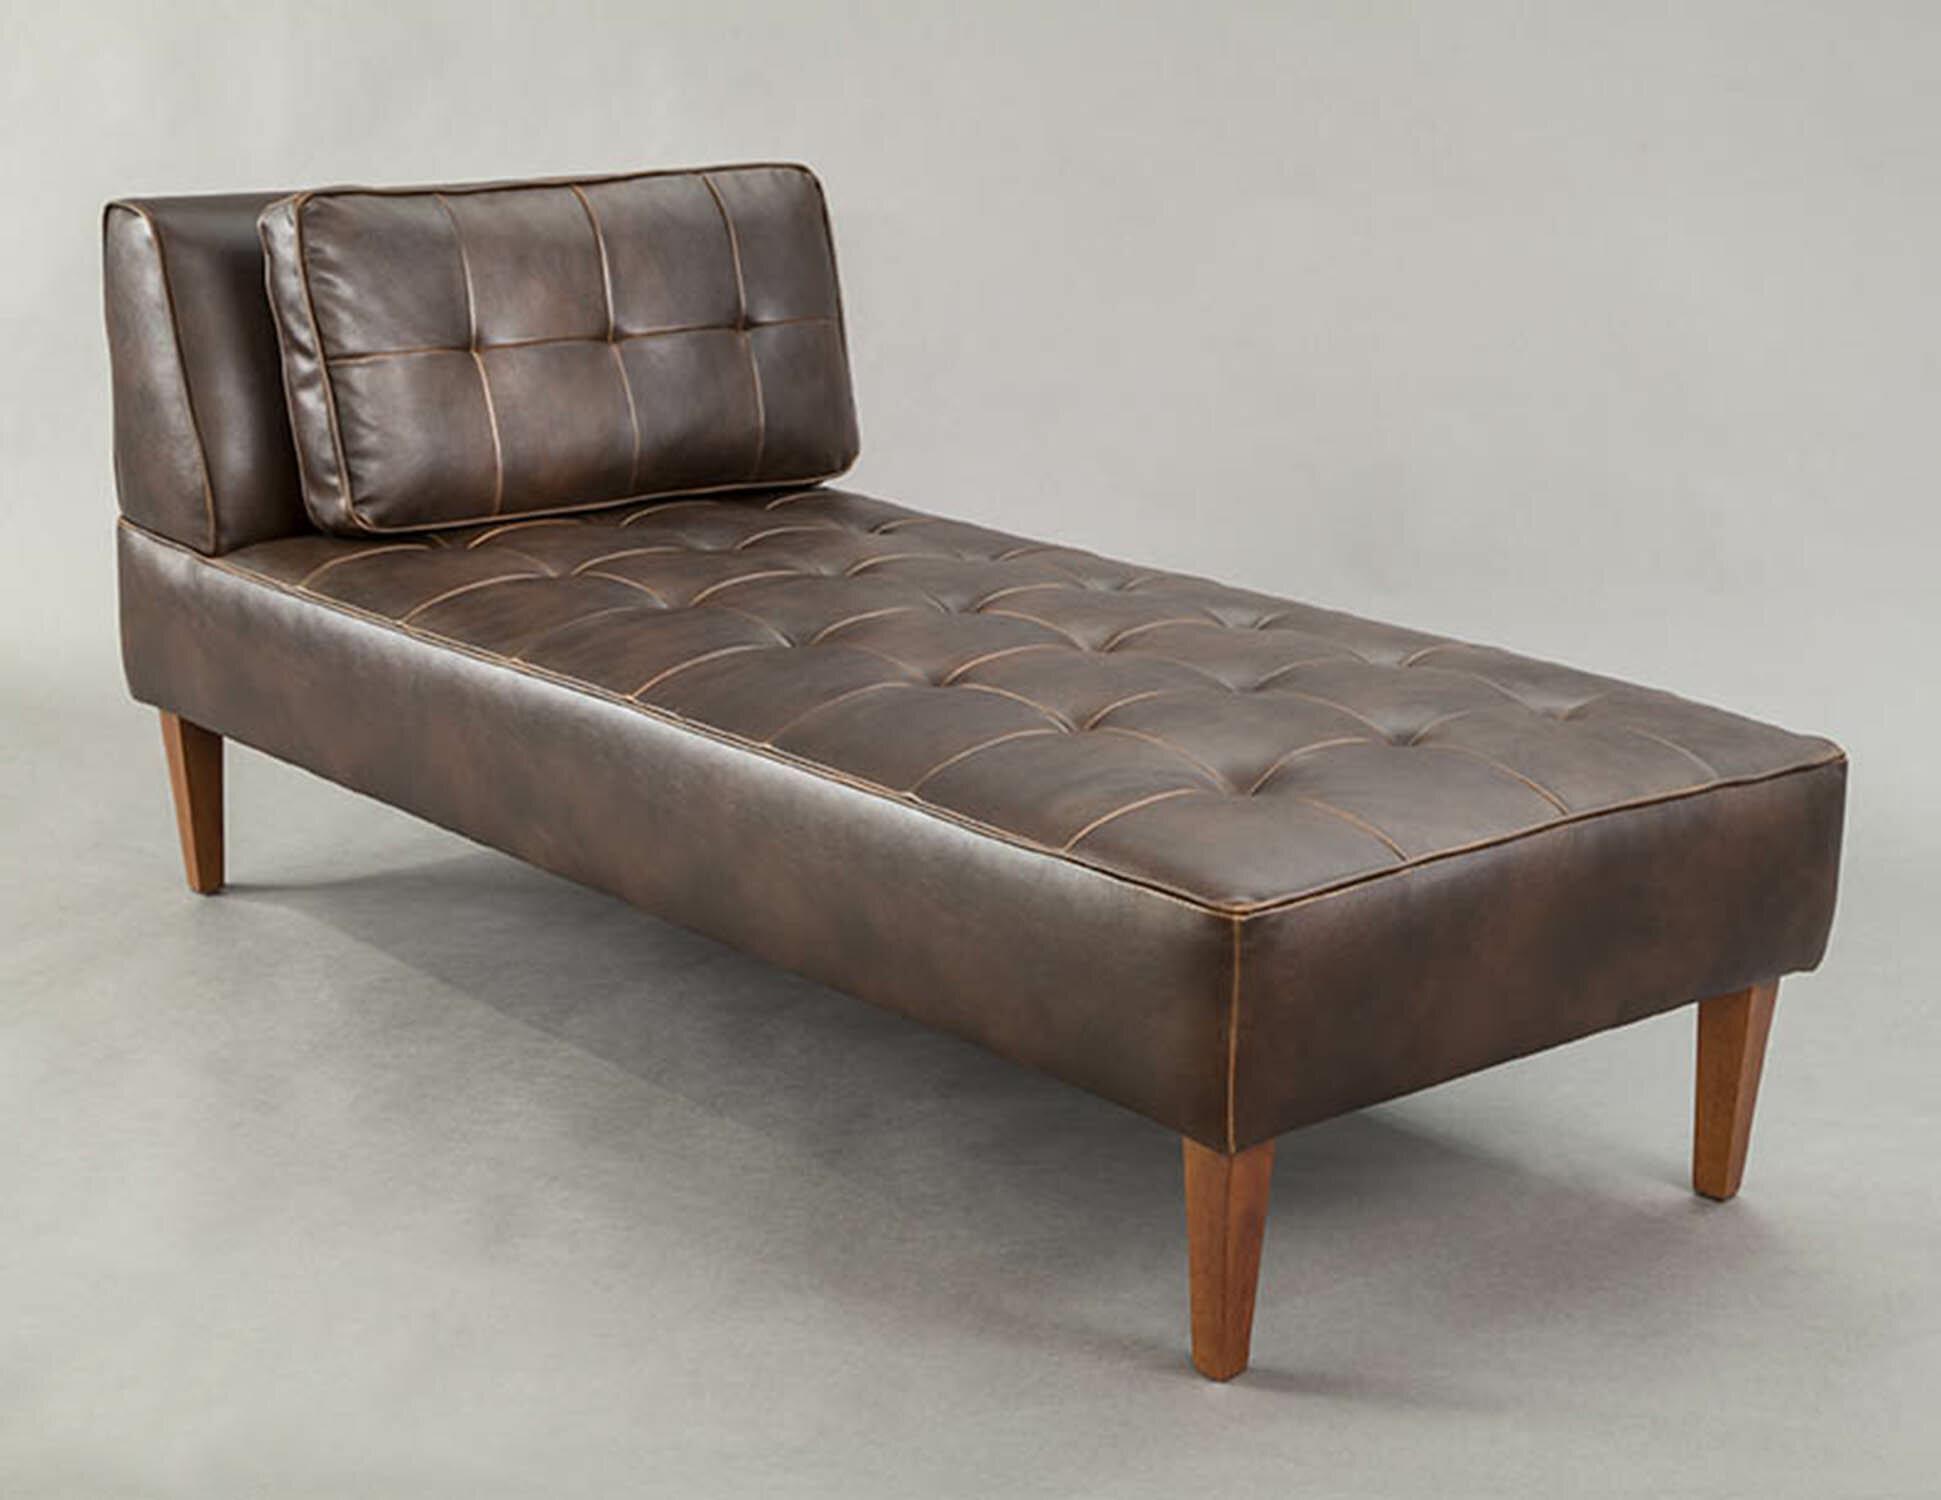 - Winston Porter Wellinhall Chaise Lounge Wayfair